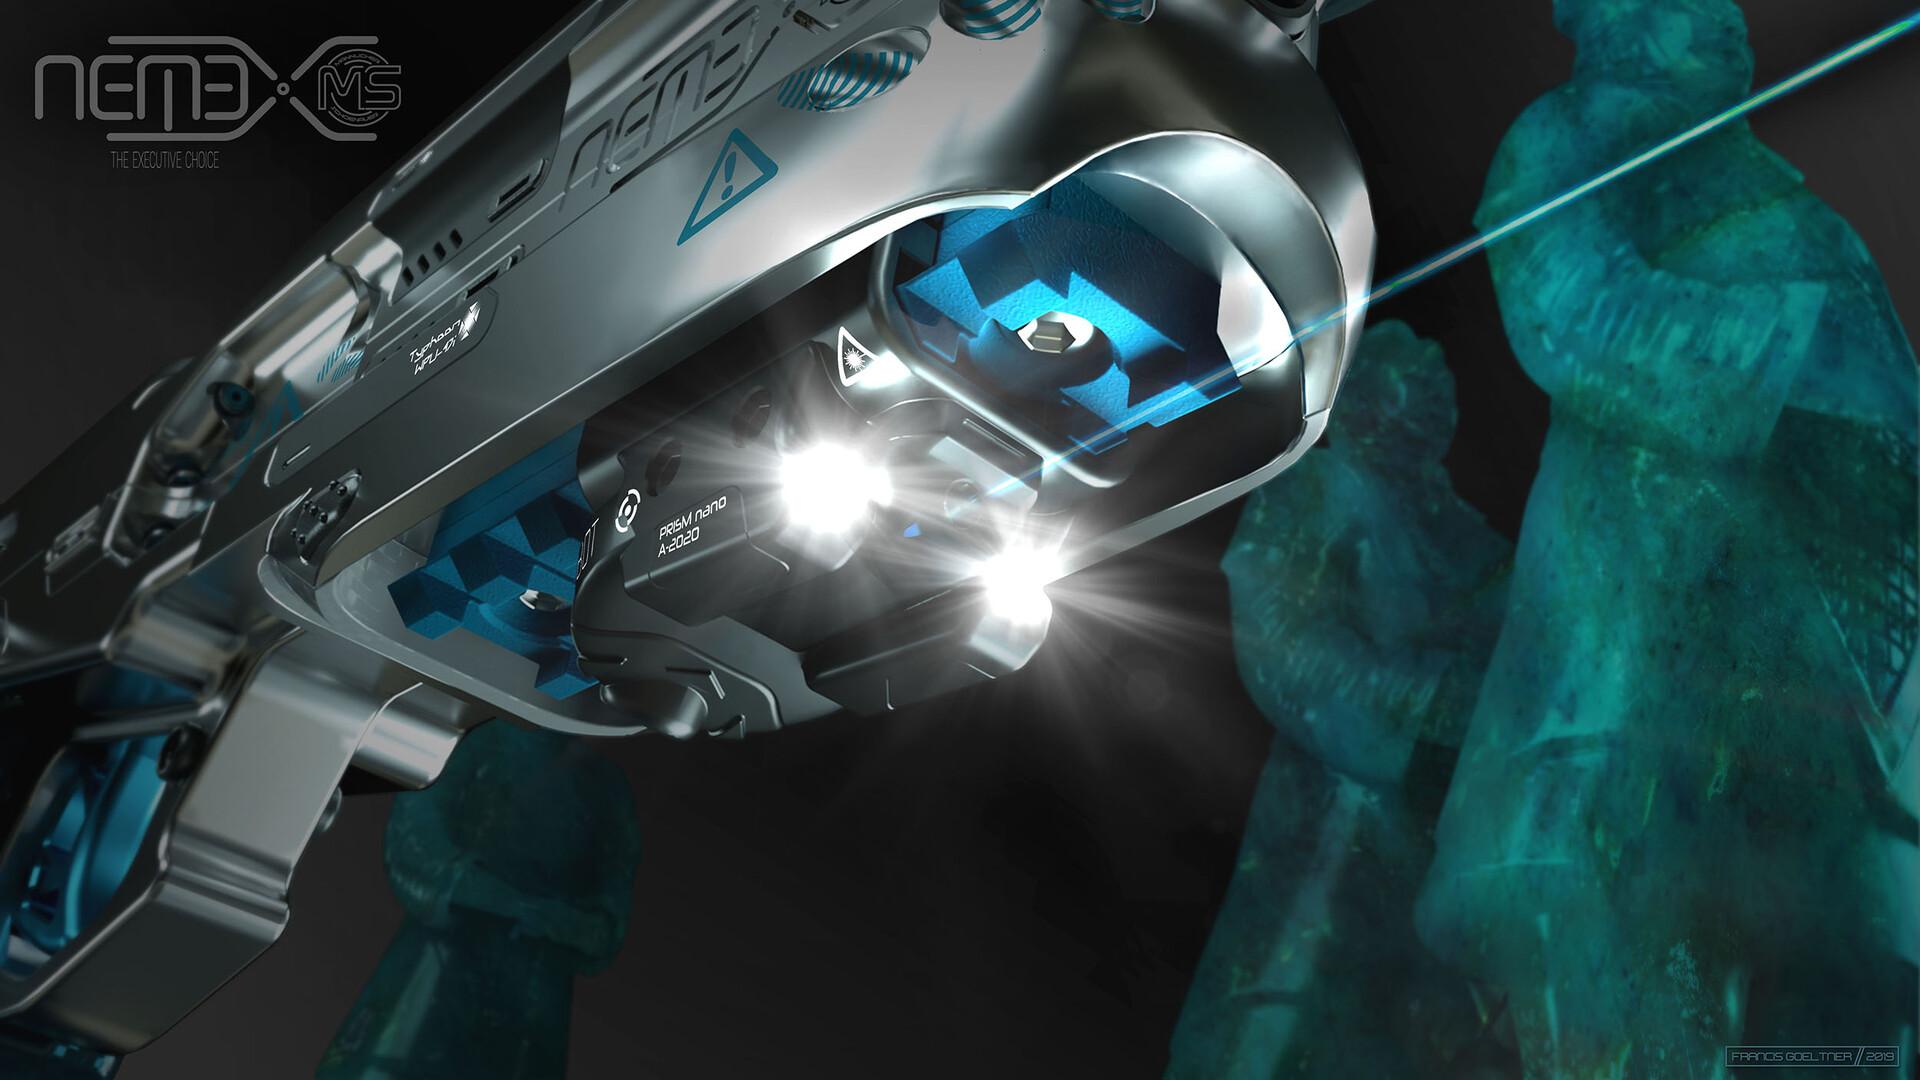 Francis goeltner marketforces nemexstudio 16flashlight laser m